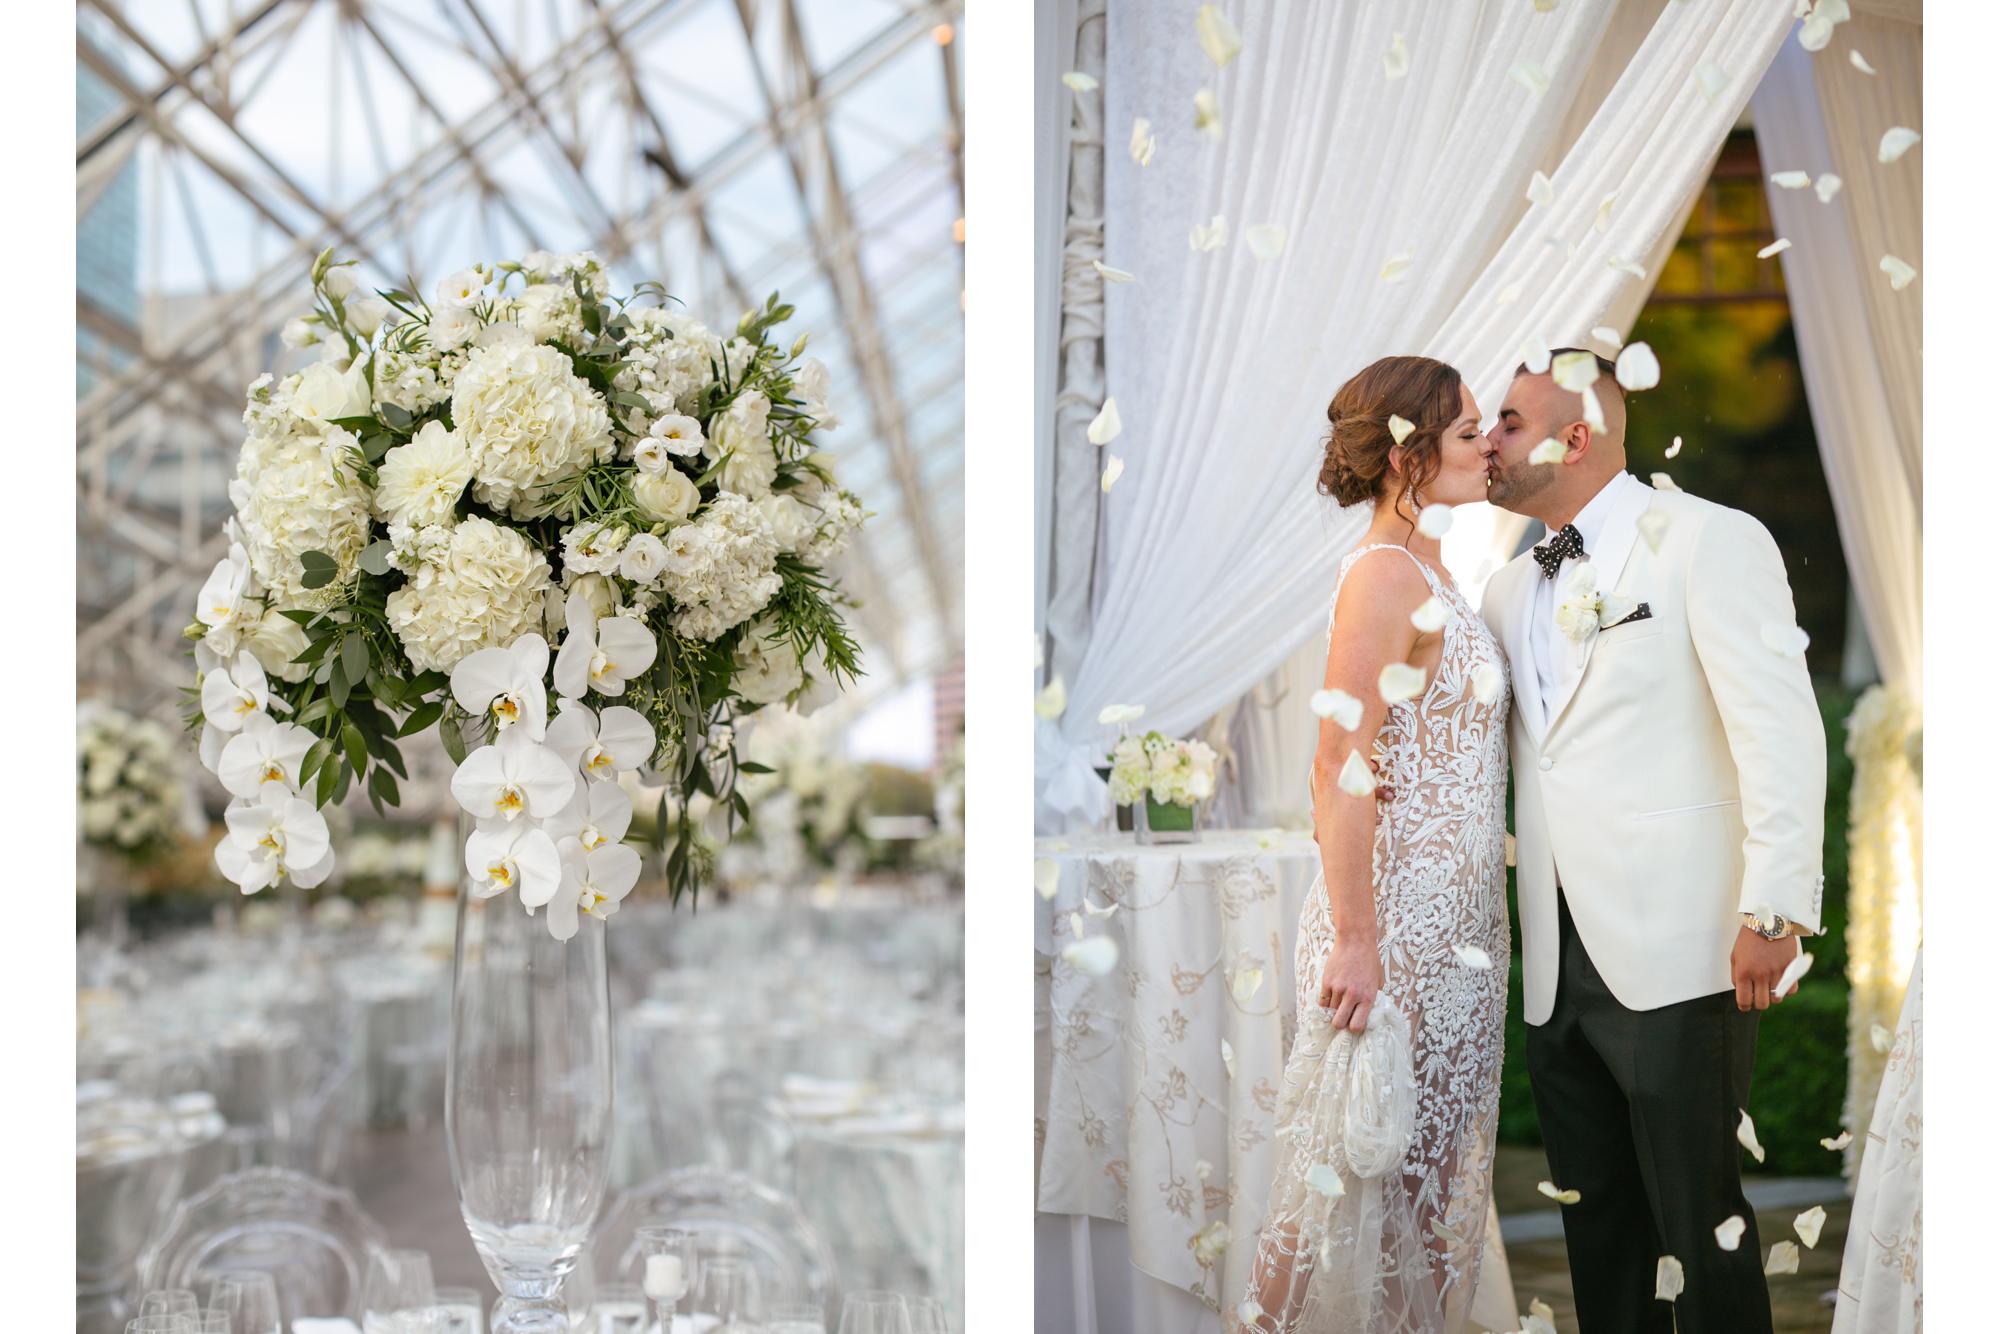 vancouver-luxury-wedding-photographer-lori-miles-22.jpg